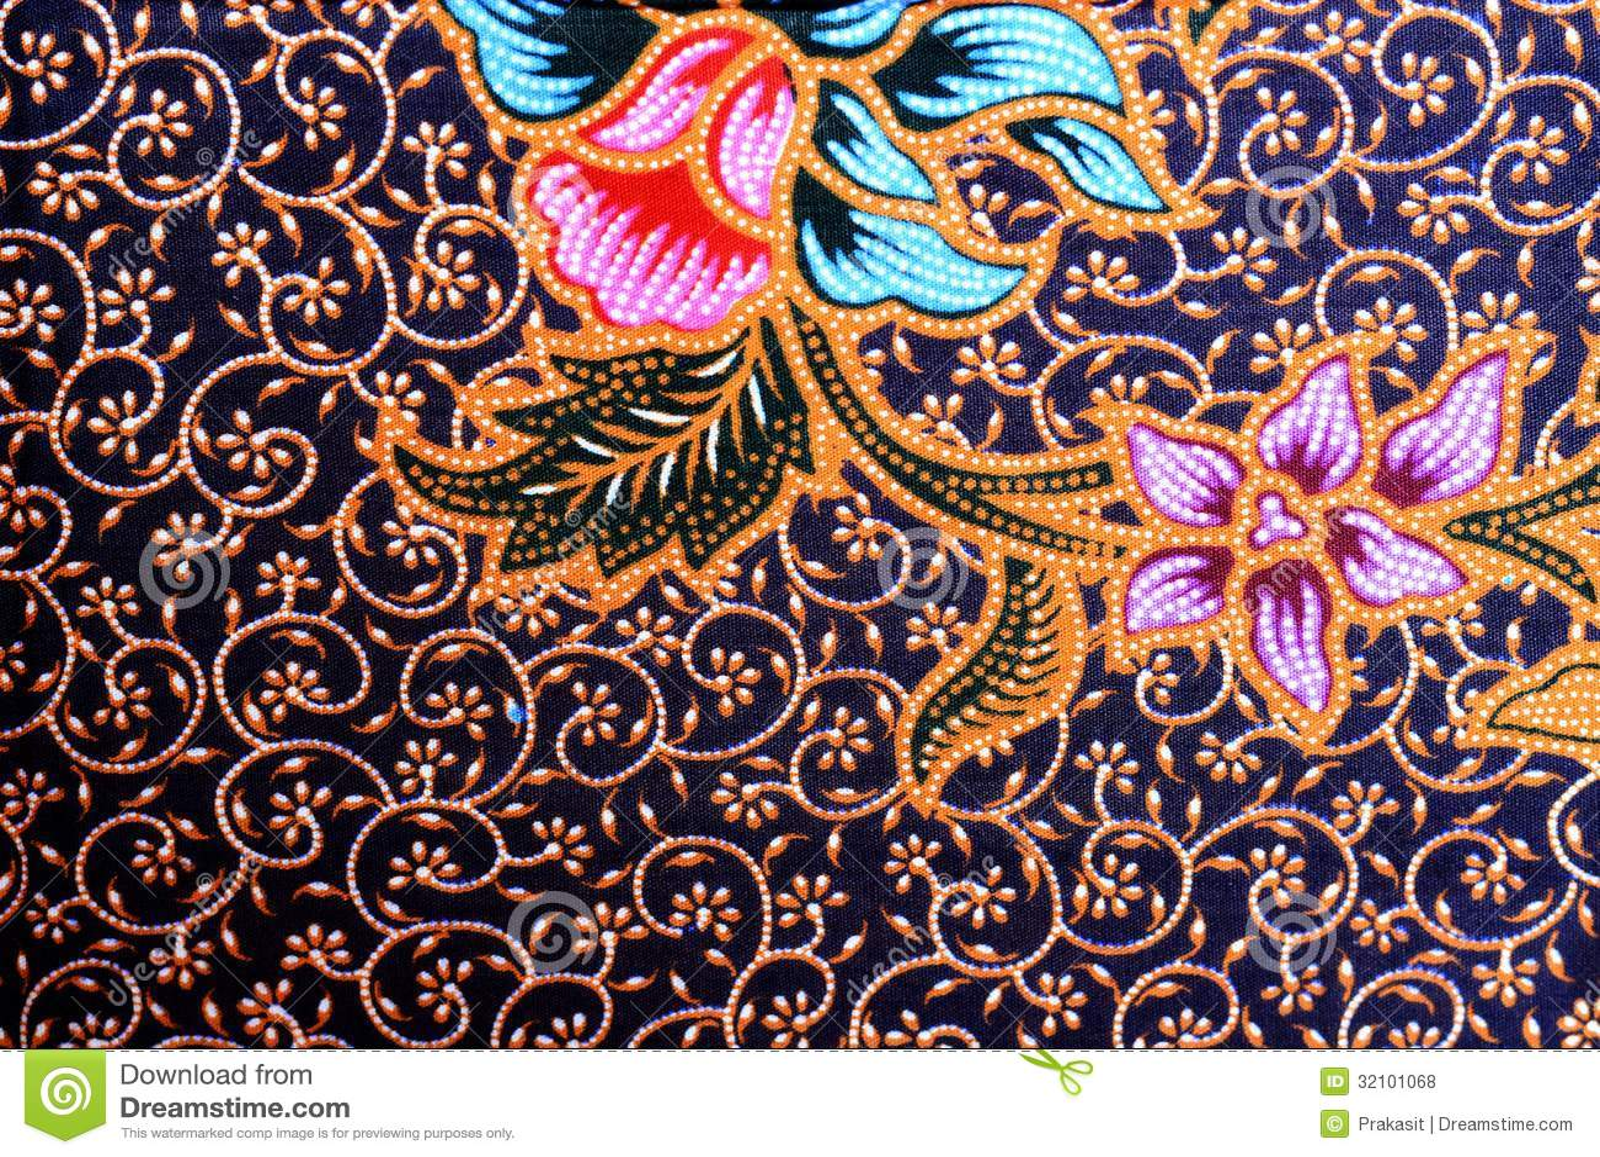 Colorful Batik Cloth Fabric Background Stock Photo Image